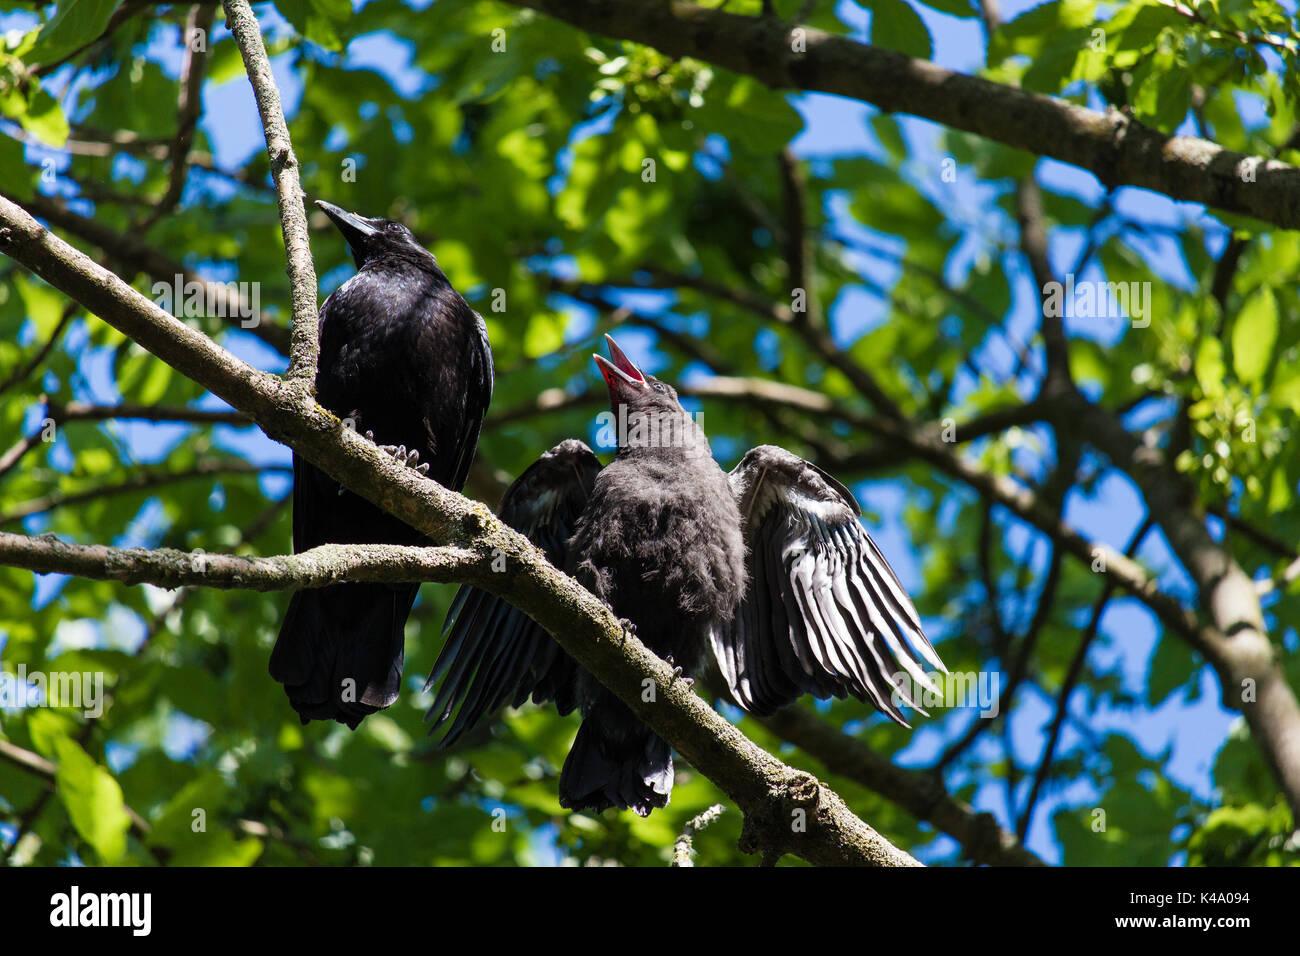 Junge Krähen im Frühling im Park gefüttert werden Imagens de Stock